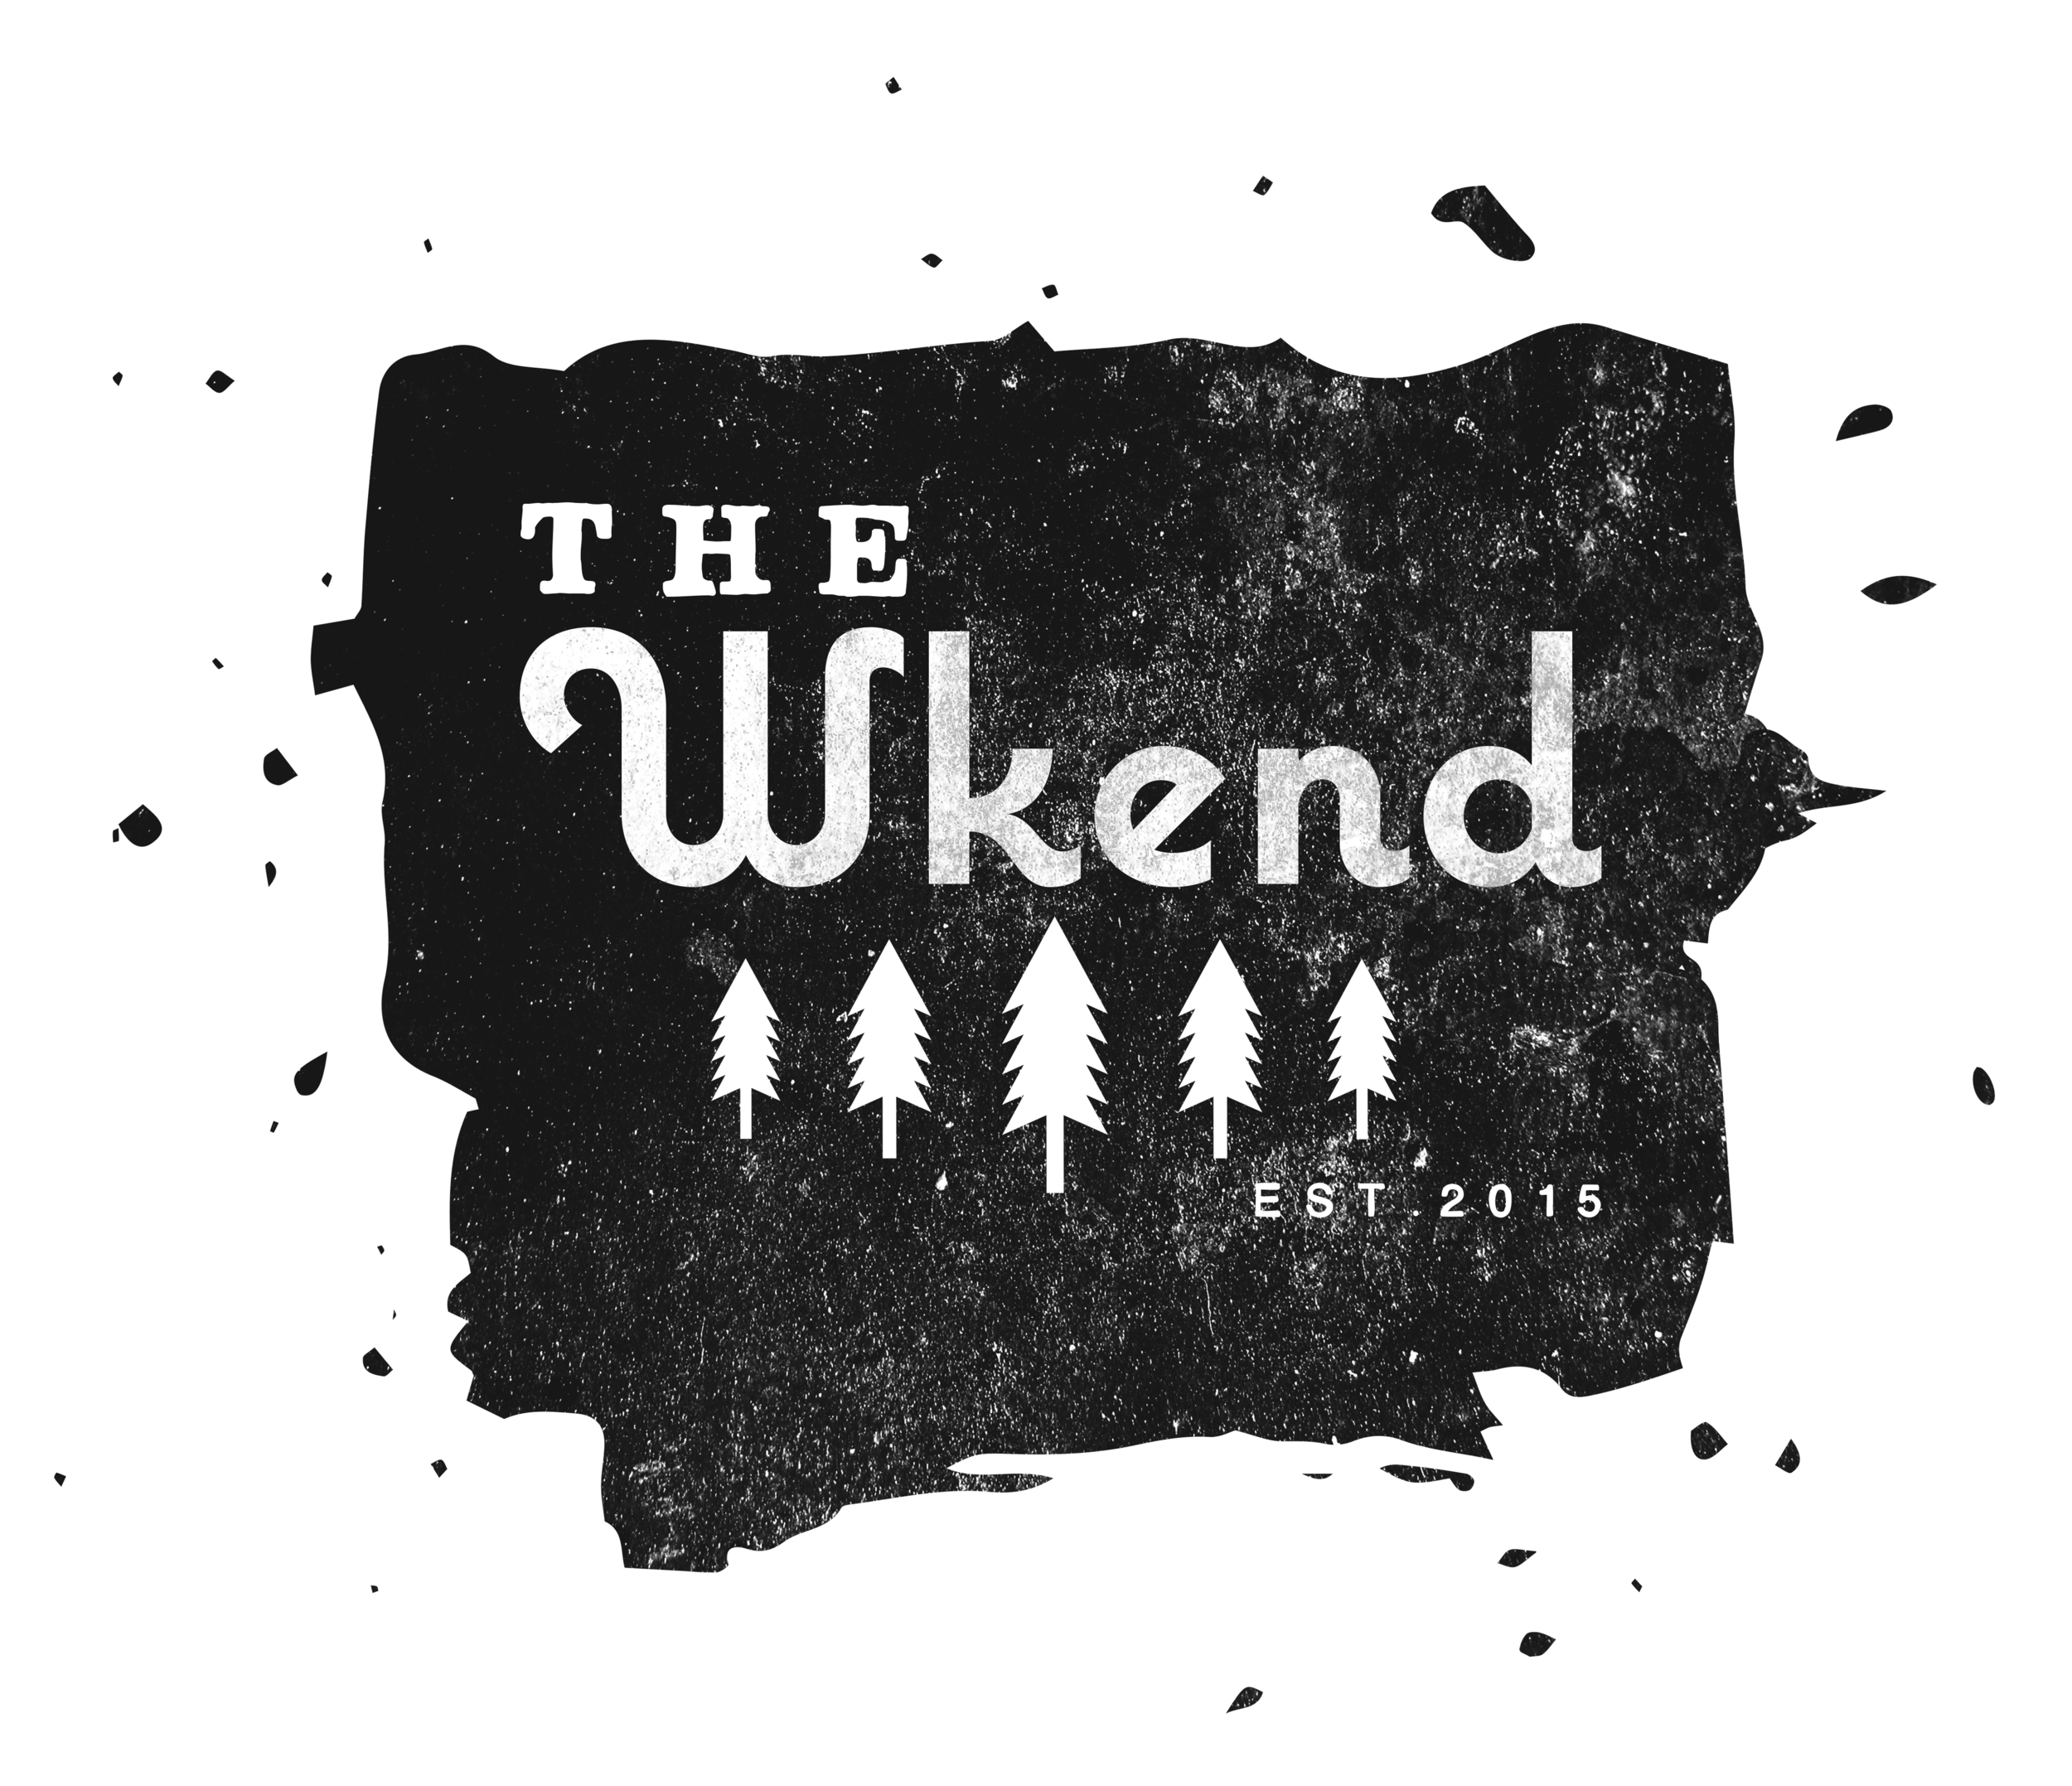 The_Wkend_Logo_(Black).png